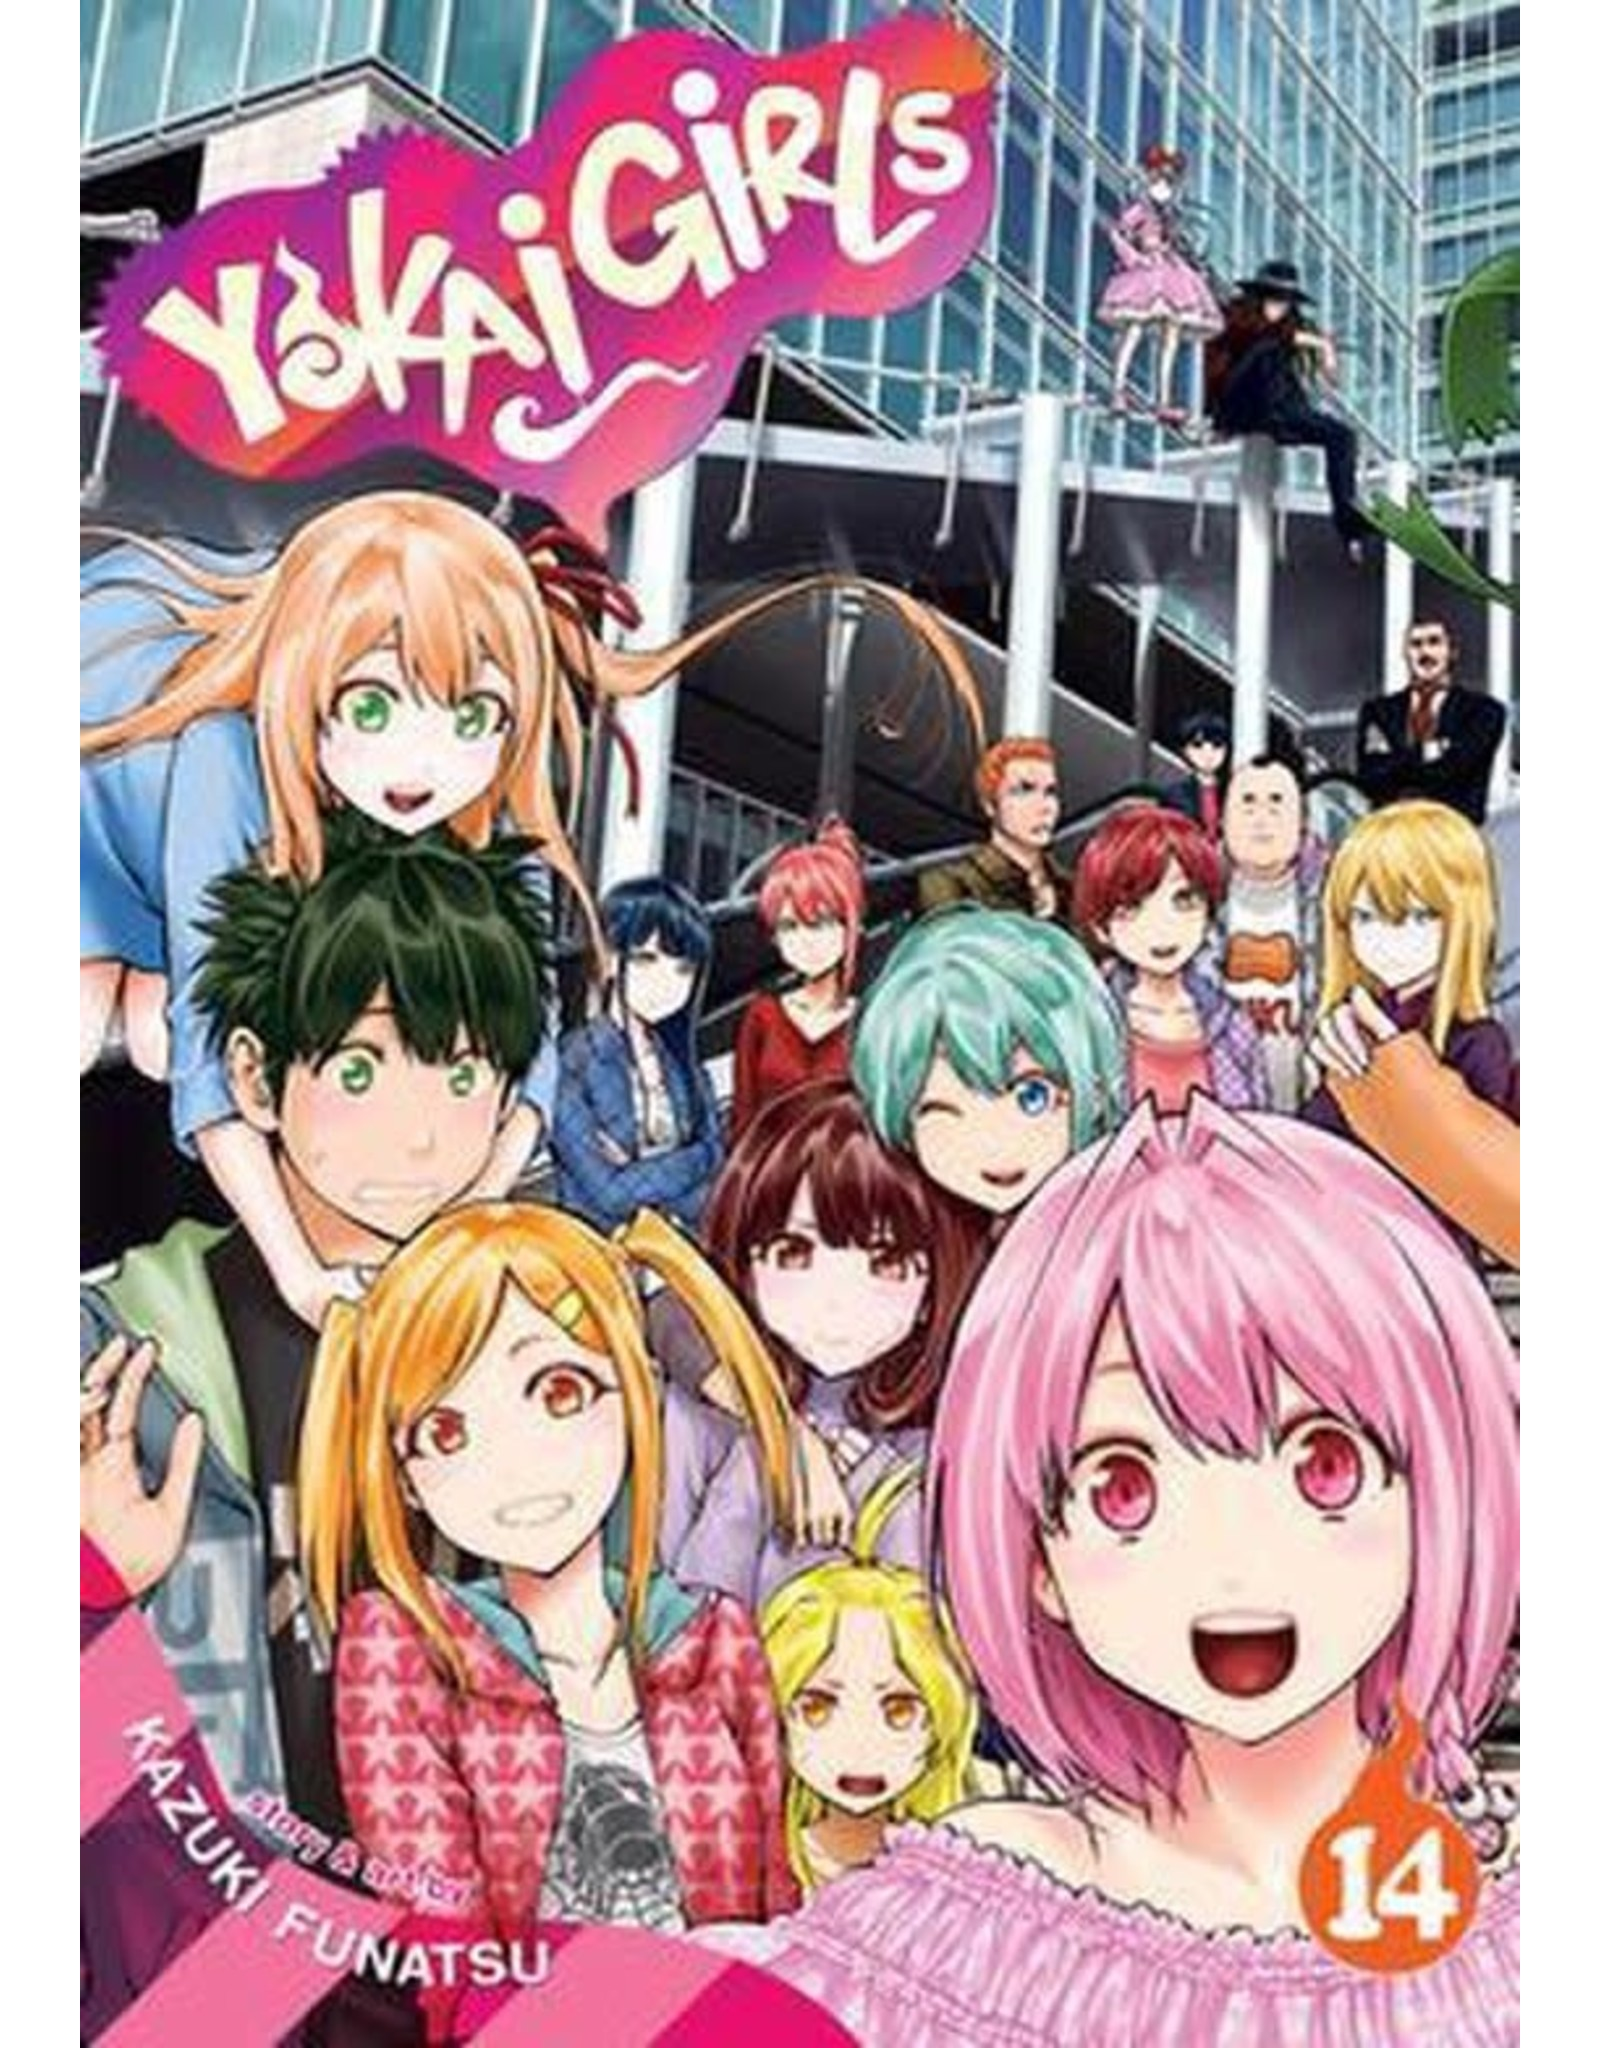 Yokai Girls 14 (Engelstalig) - Manga